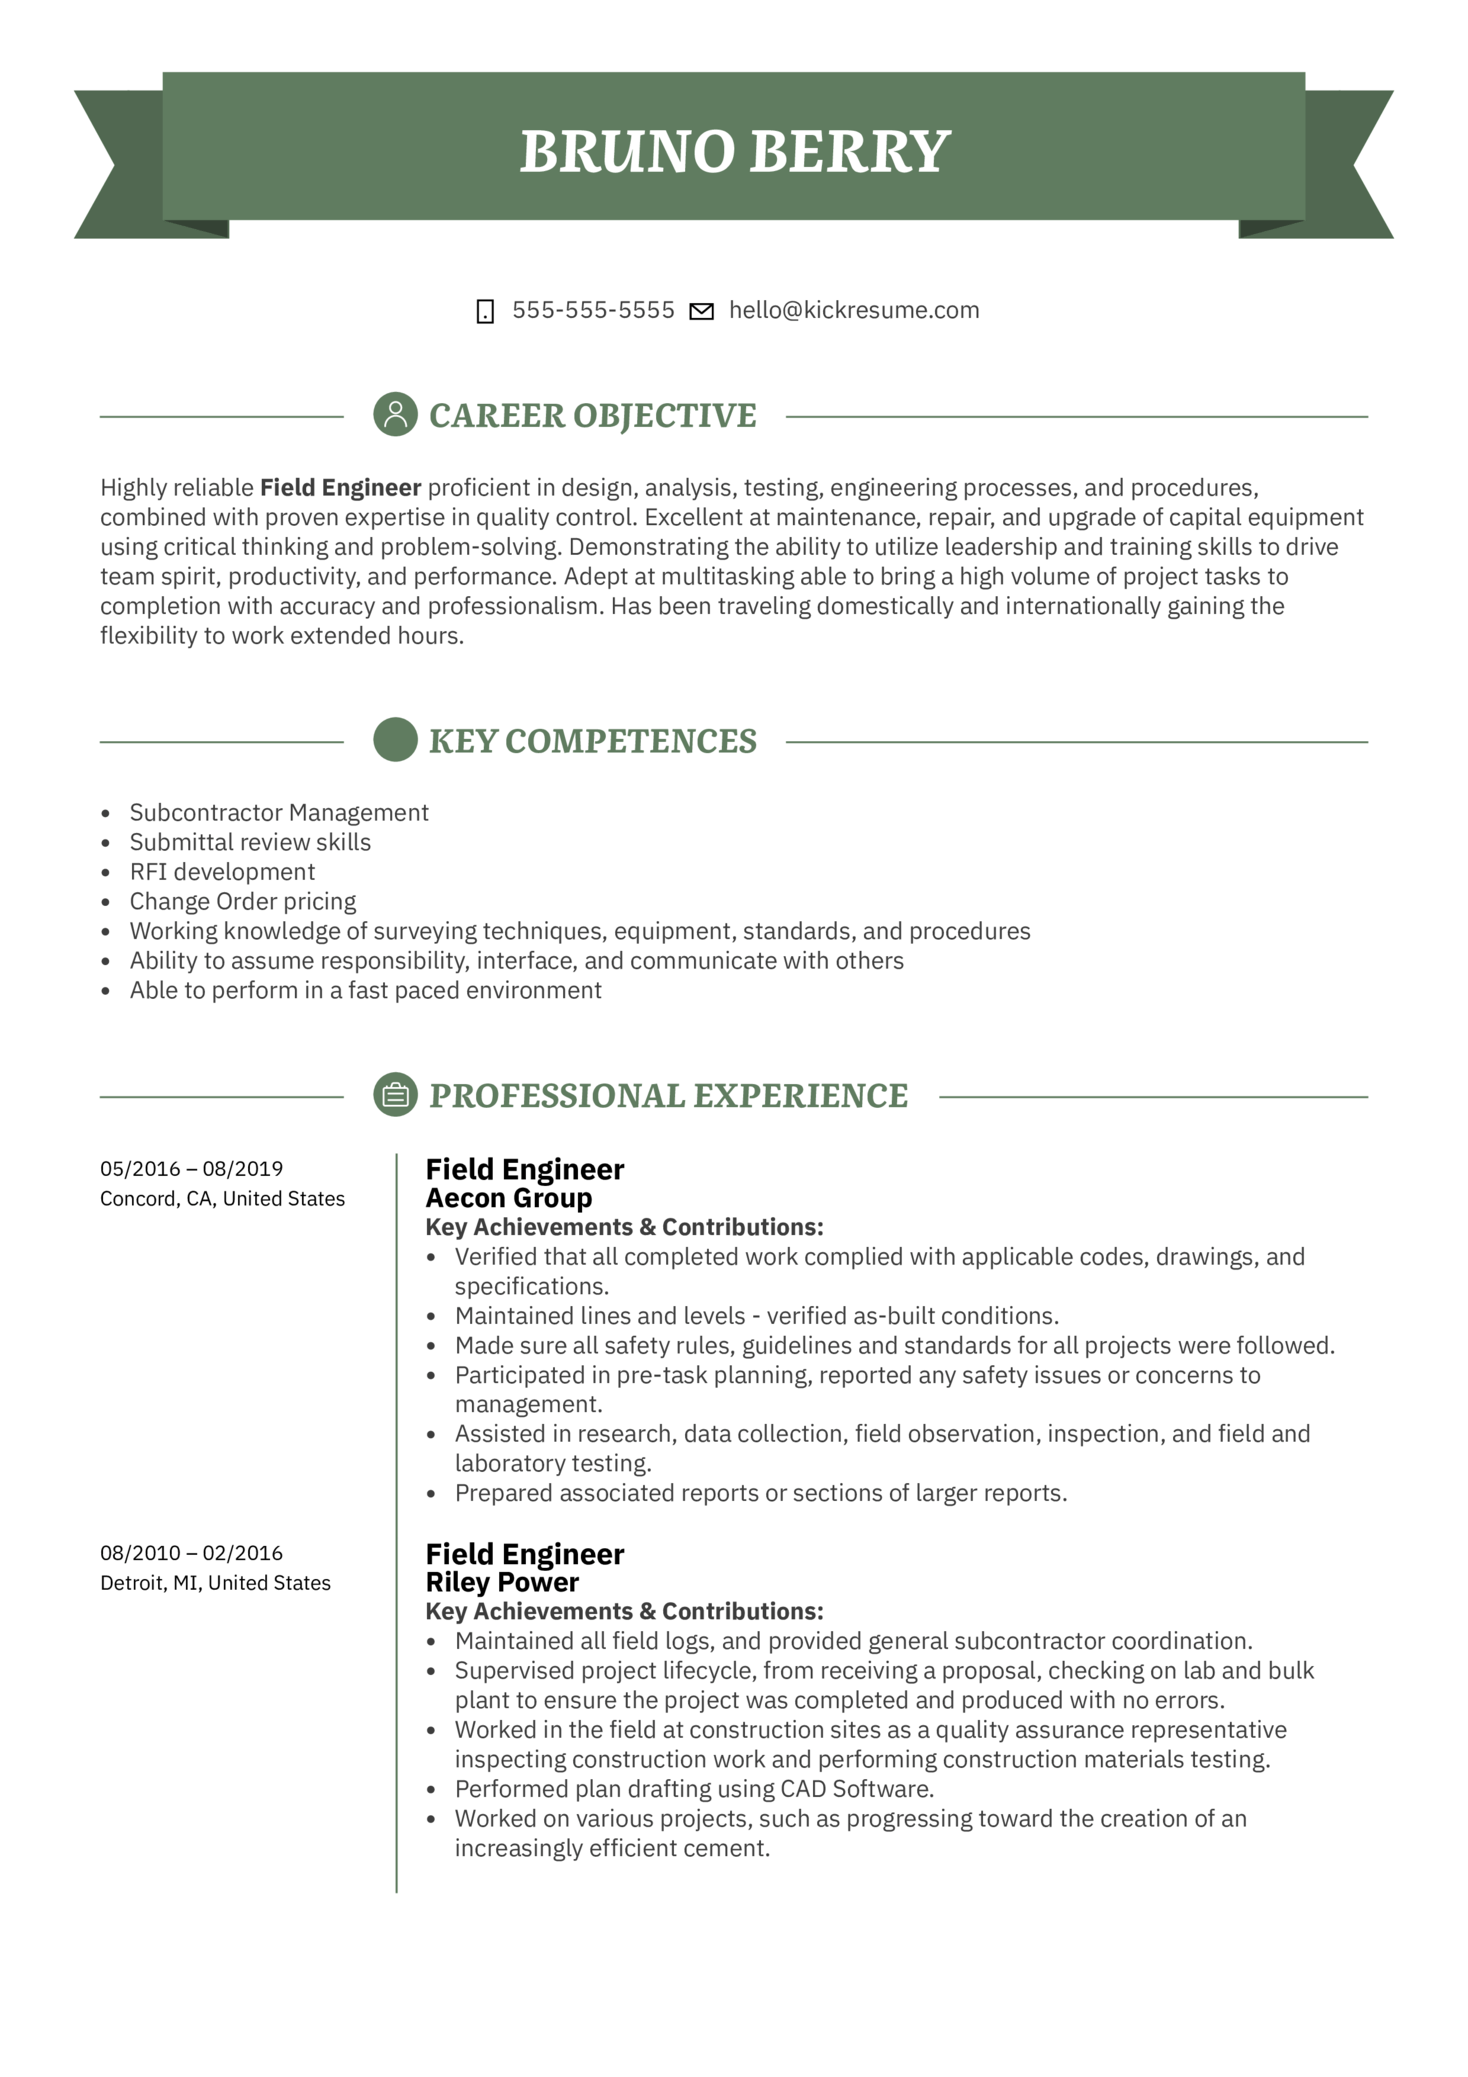 Field Engineer Resume Example (časť 1)